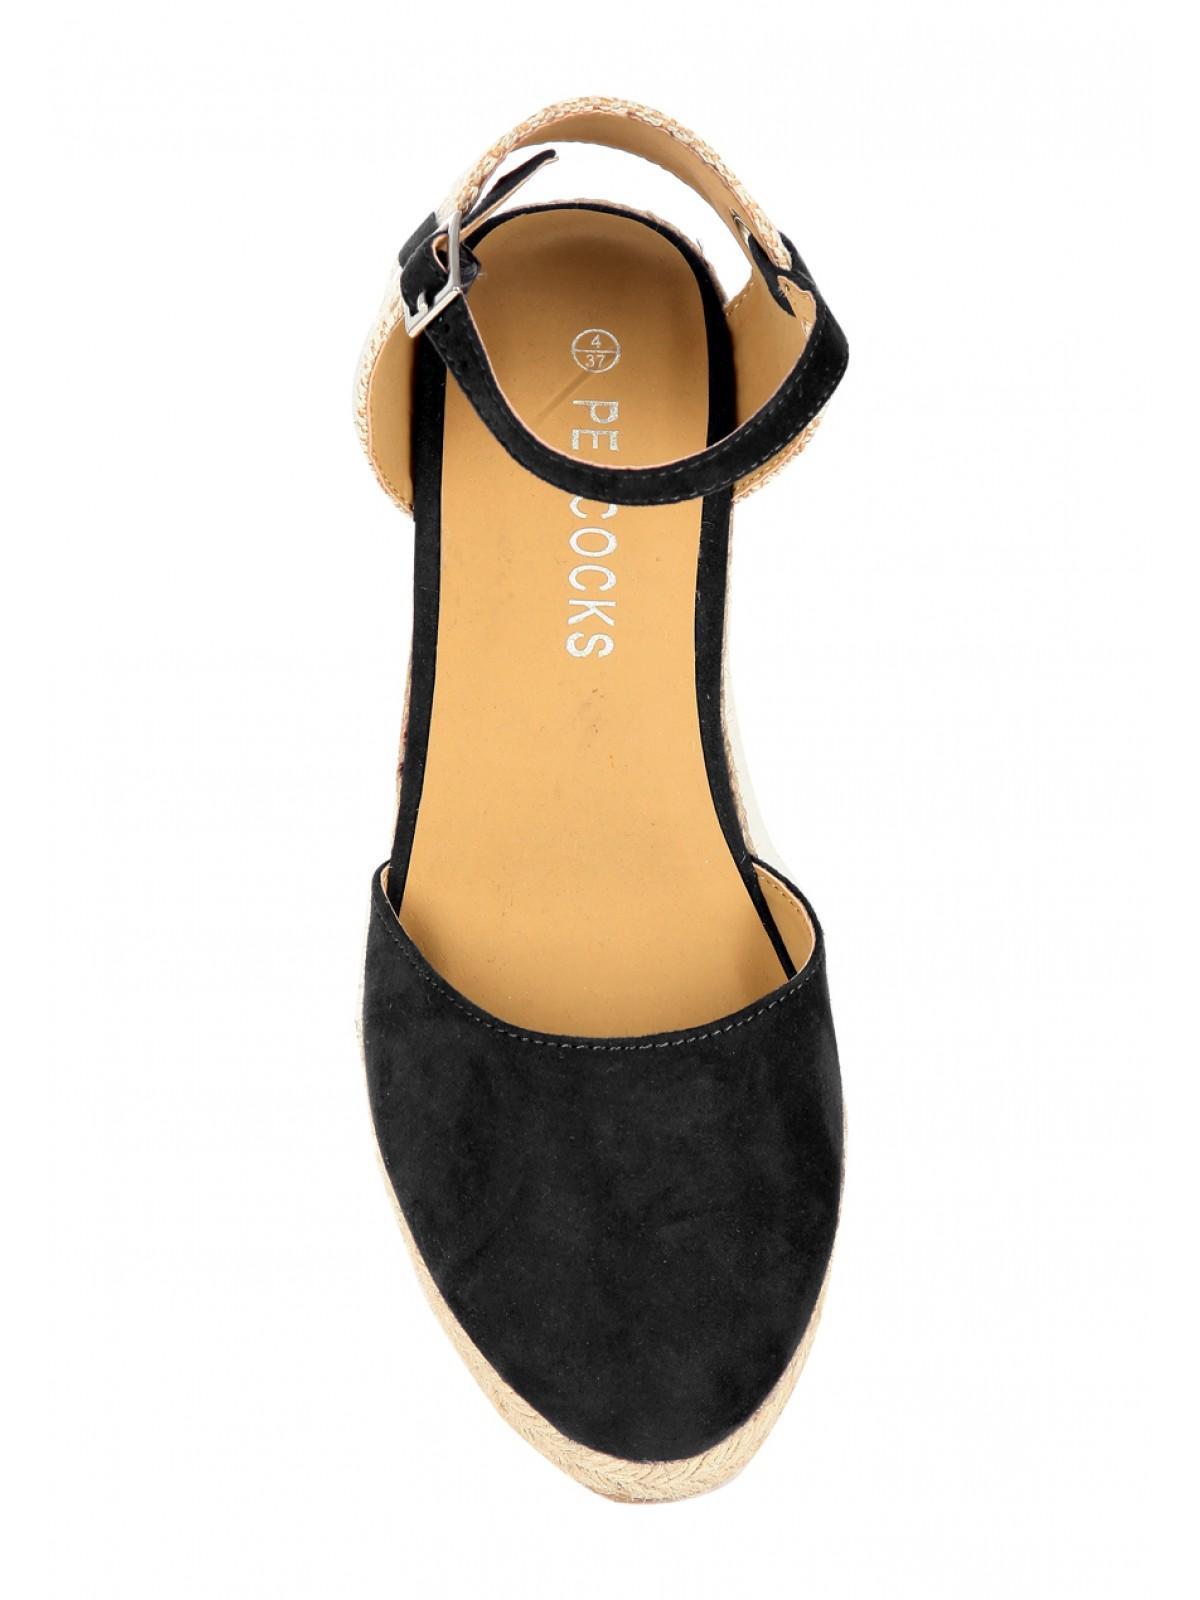 Flat Shoes, Women s Espadrilles, Moccasins for Women